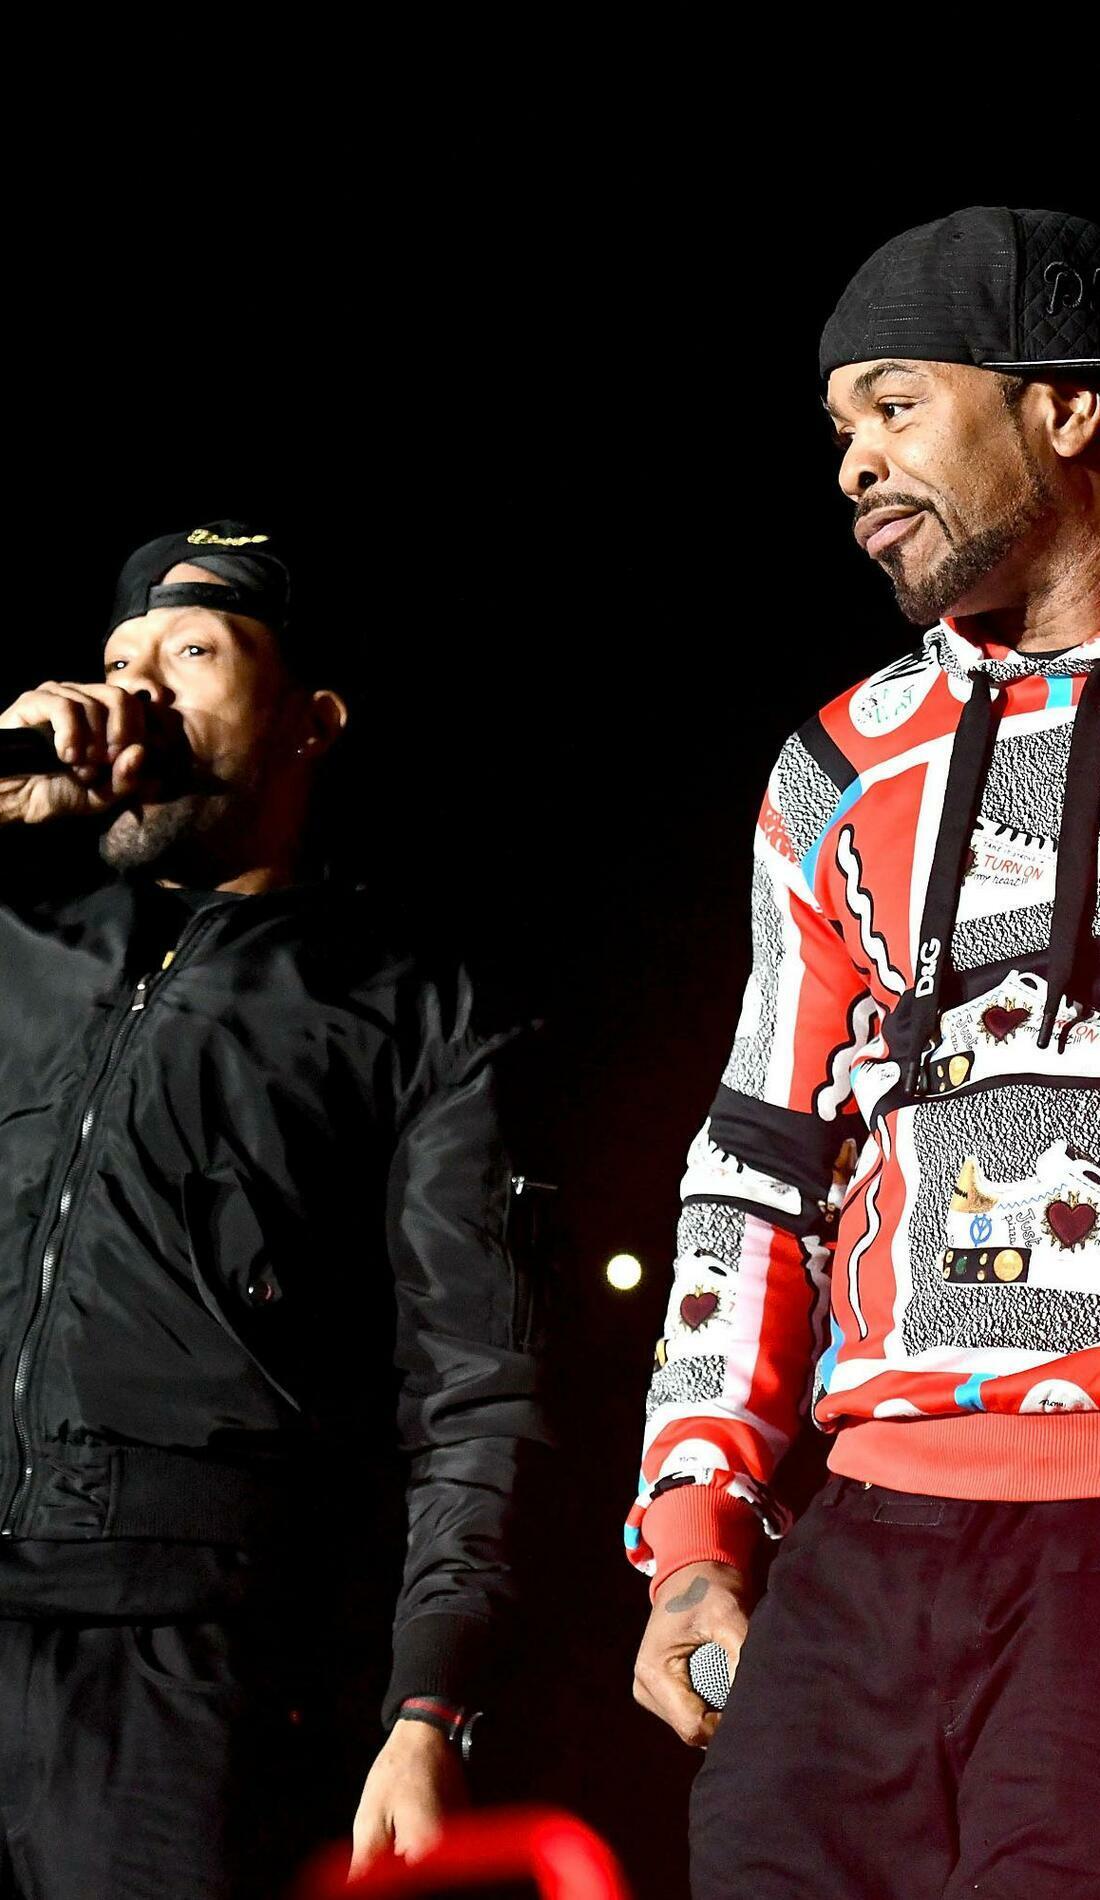 A Method Man & Redman live event